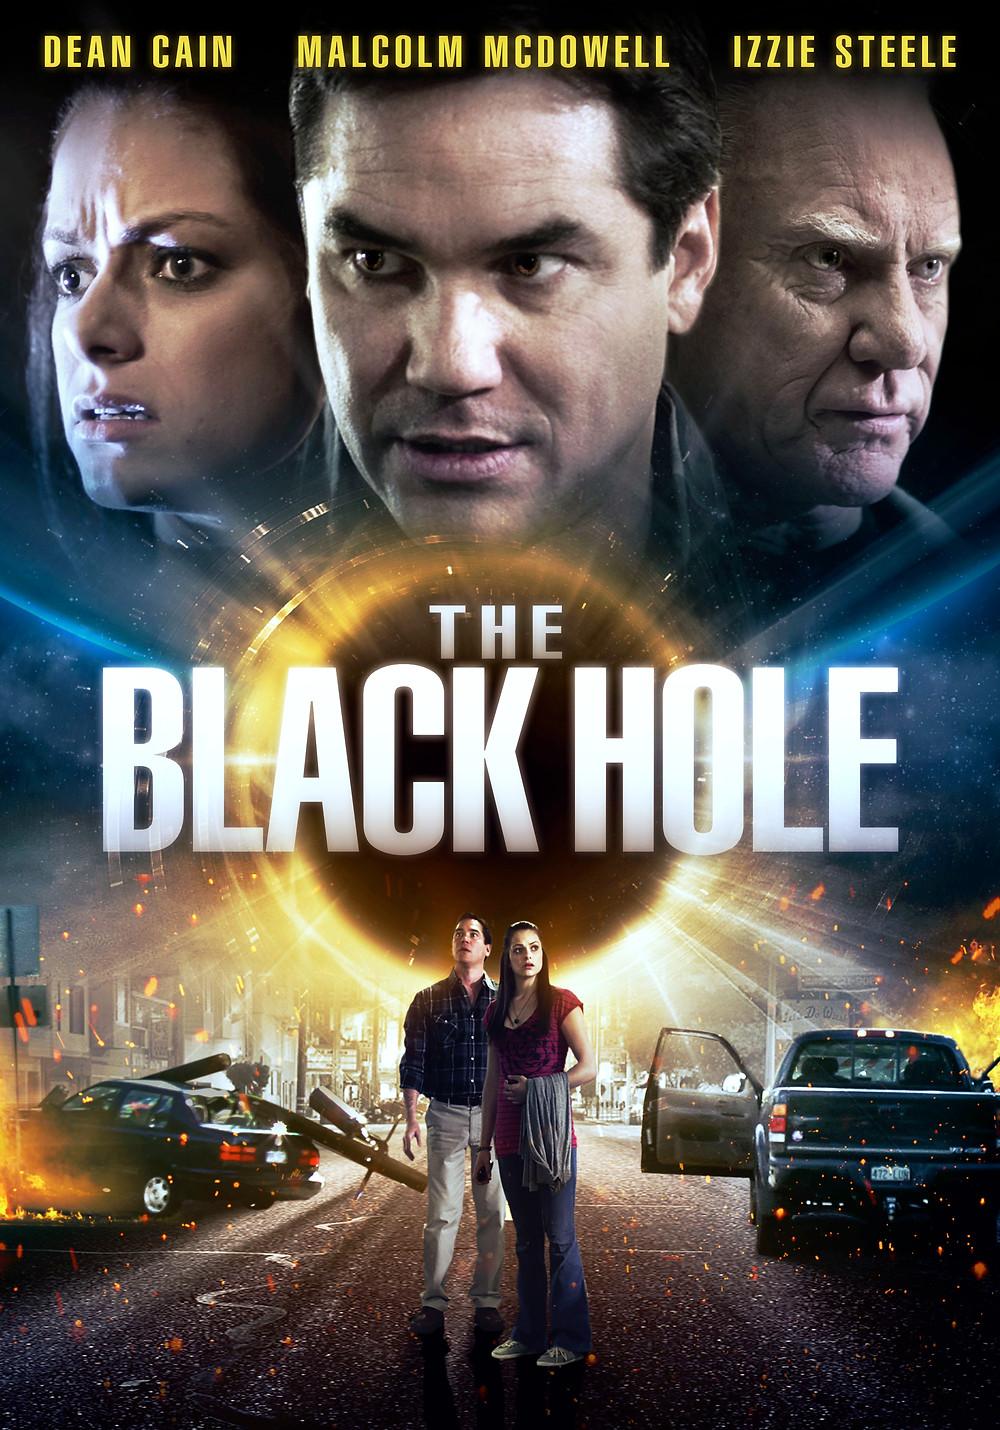 THE_BLACK_HOLE_ONE_SHEET_V0b(1).jpg